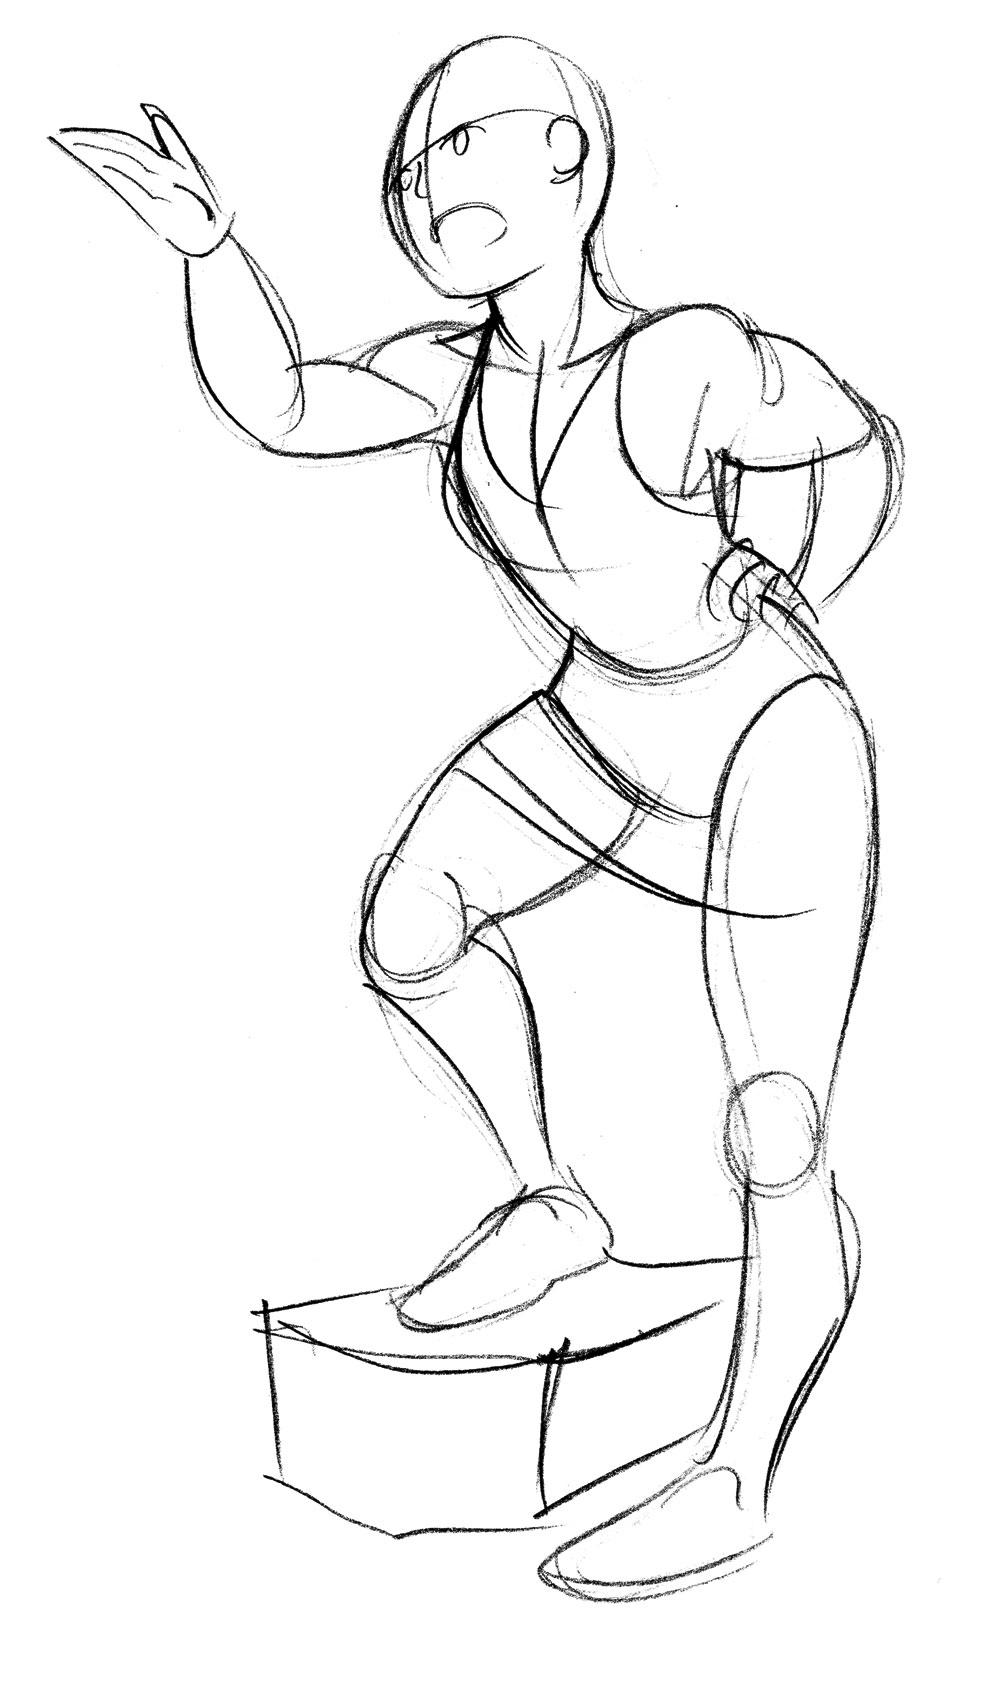 984x1684 Manga Monday How To Draw A Confident Pose